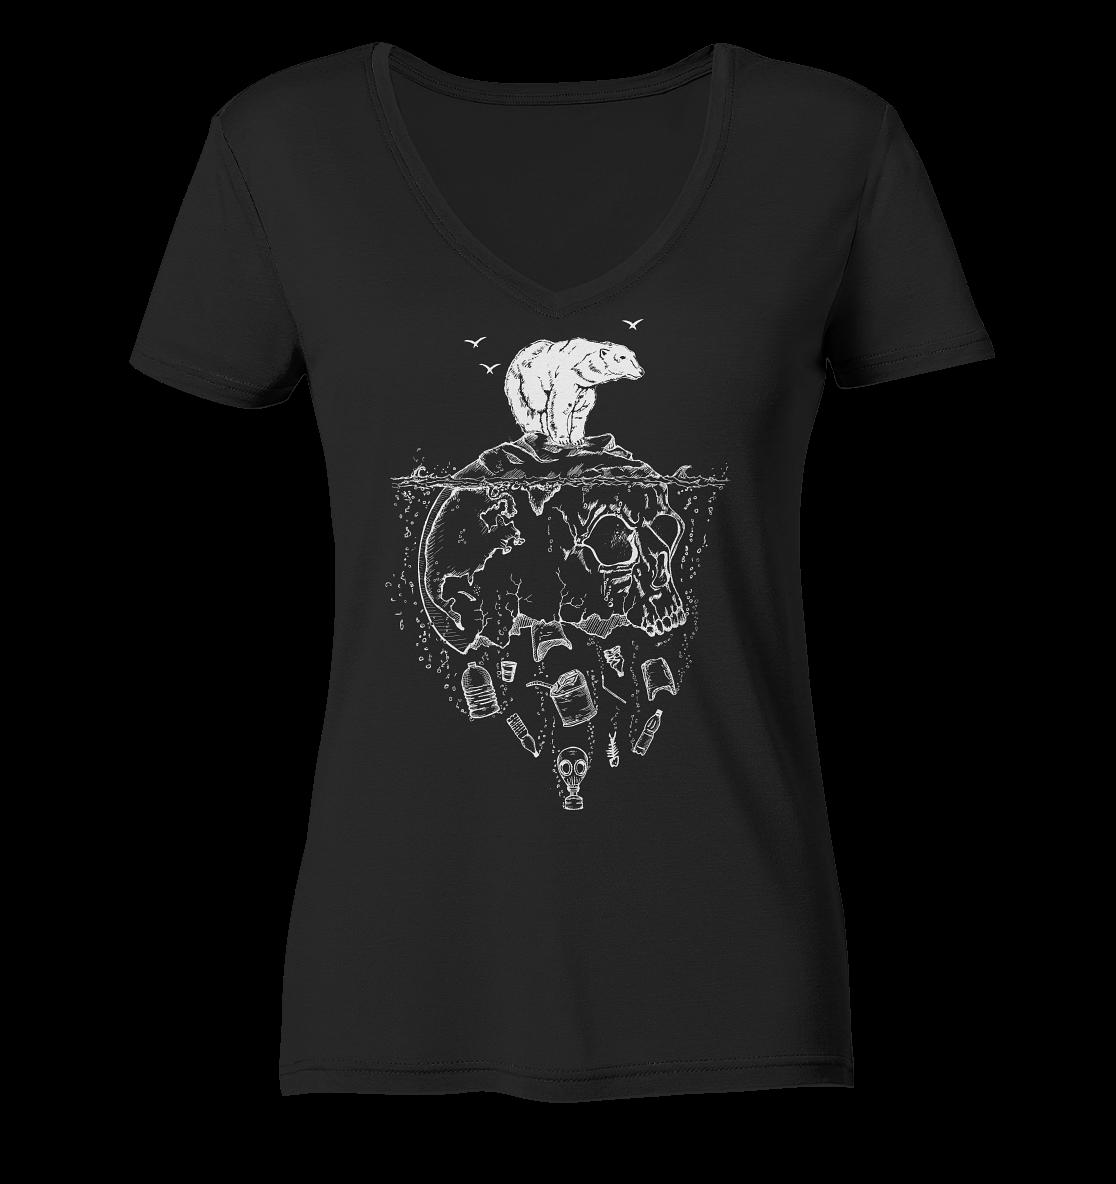 front-ladies-organic-v-neck-shirt-272727-1116x-3.png